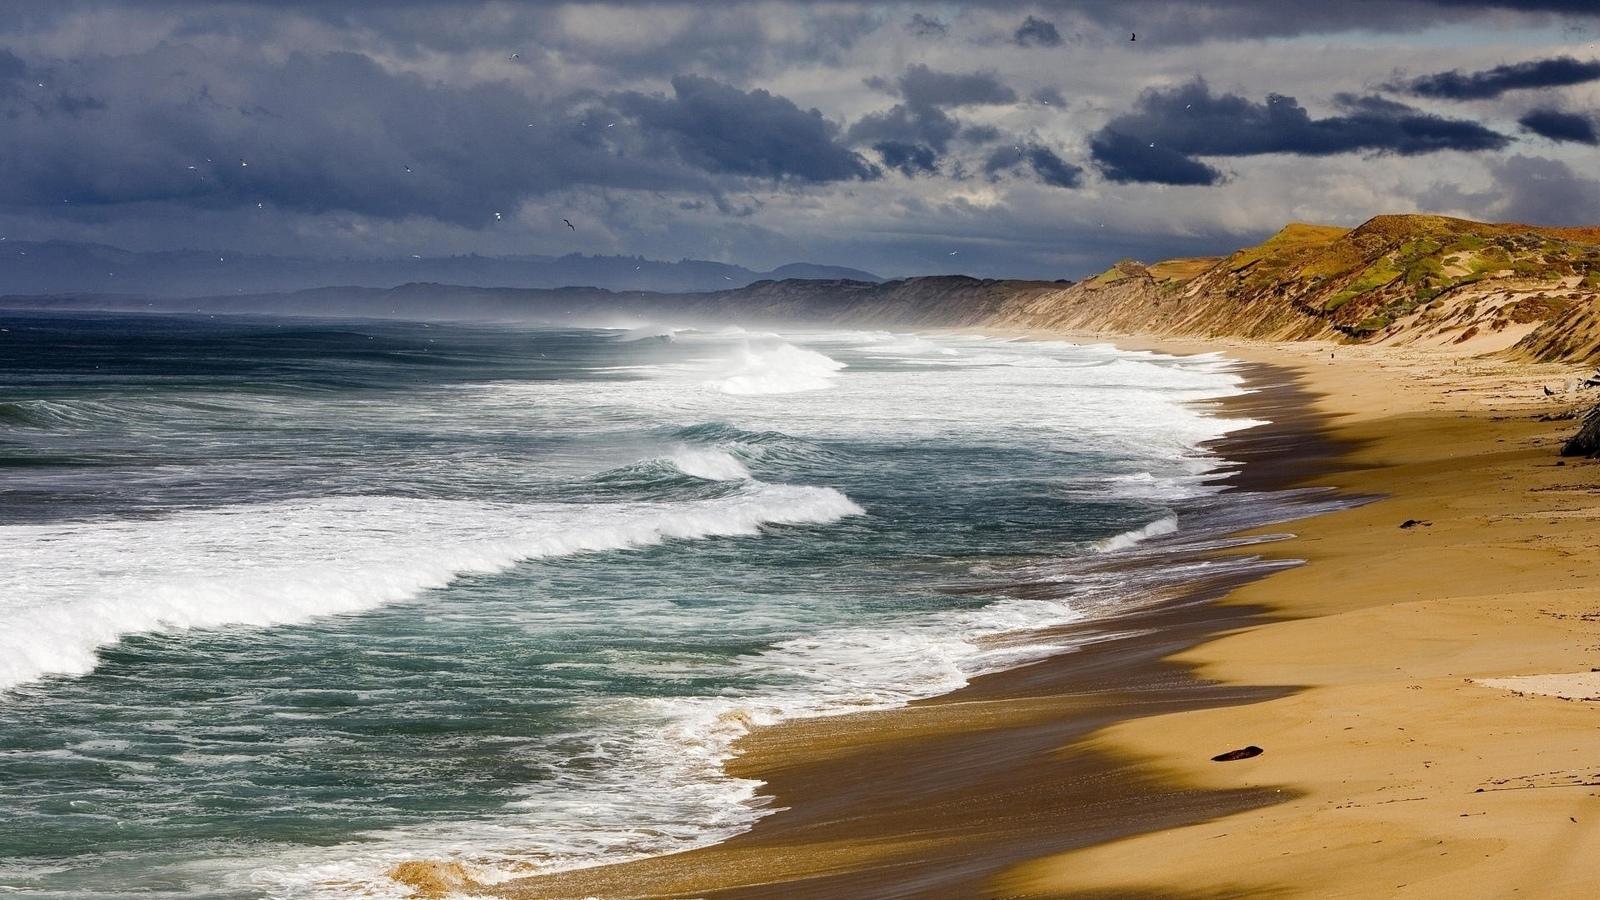 Слушать музыку шум моря онлайн 19 фотография